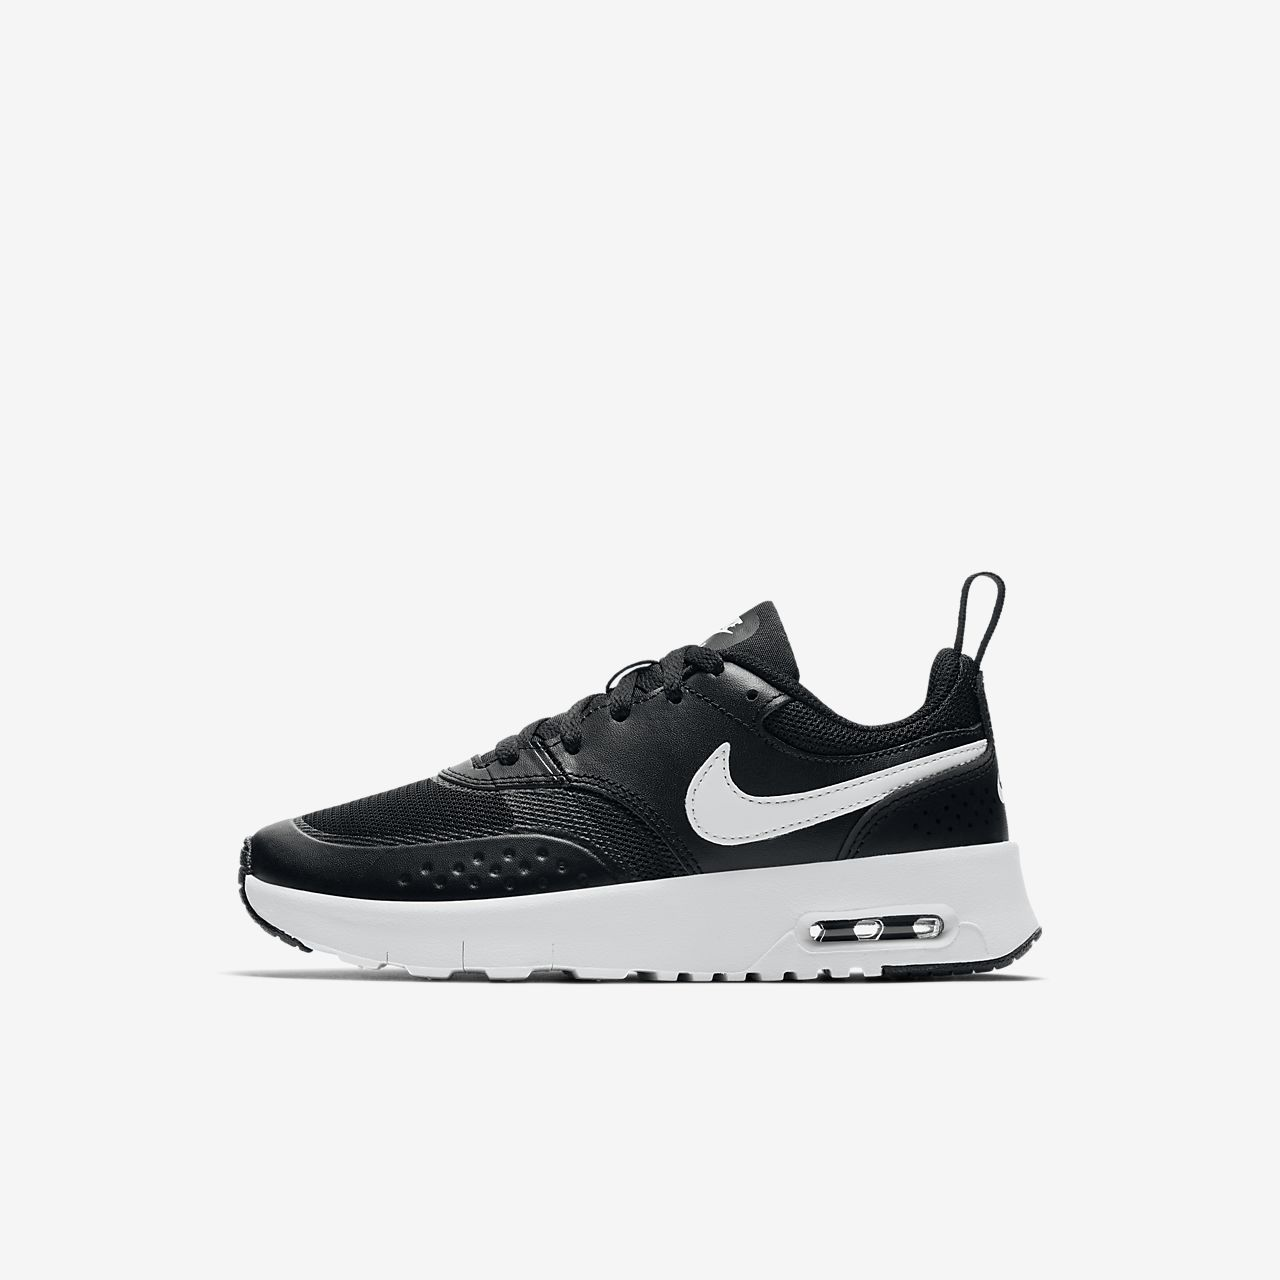 Nike Chaussures De Sport Laag Esprit 'vision Air Max' 8FkxPrVtPL